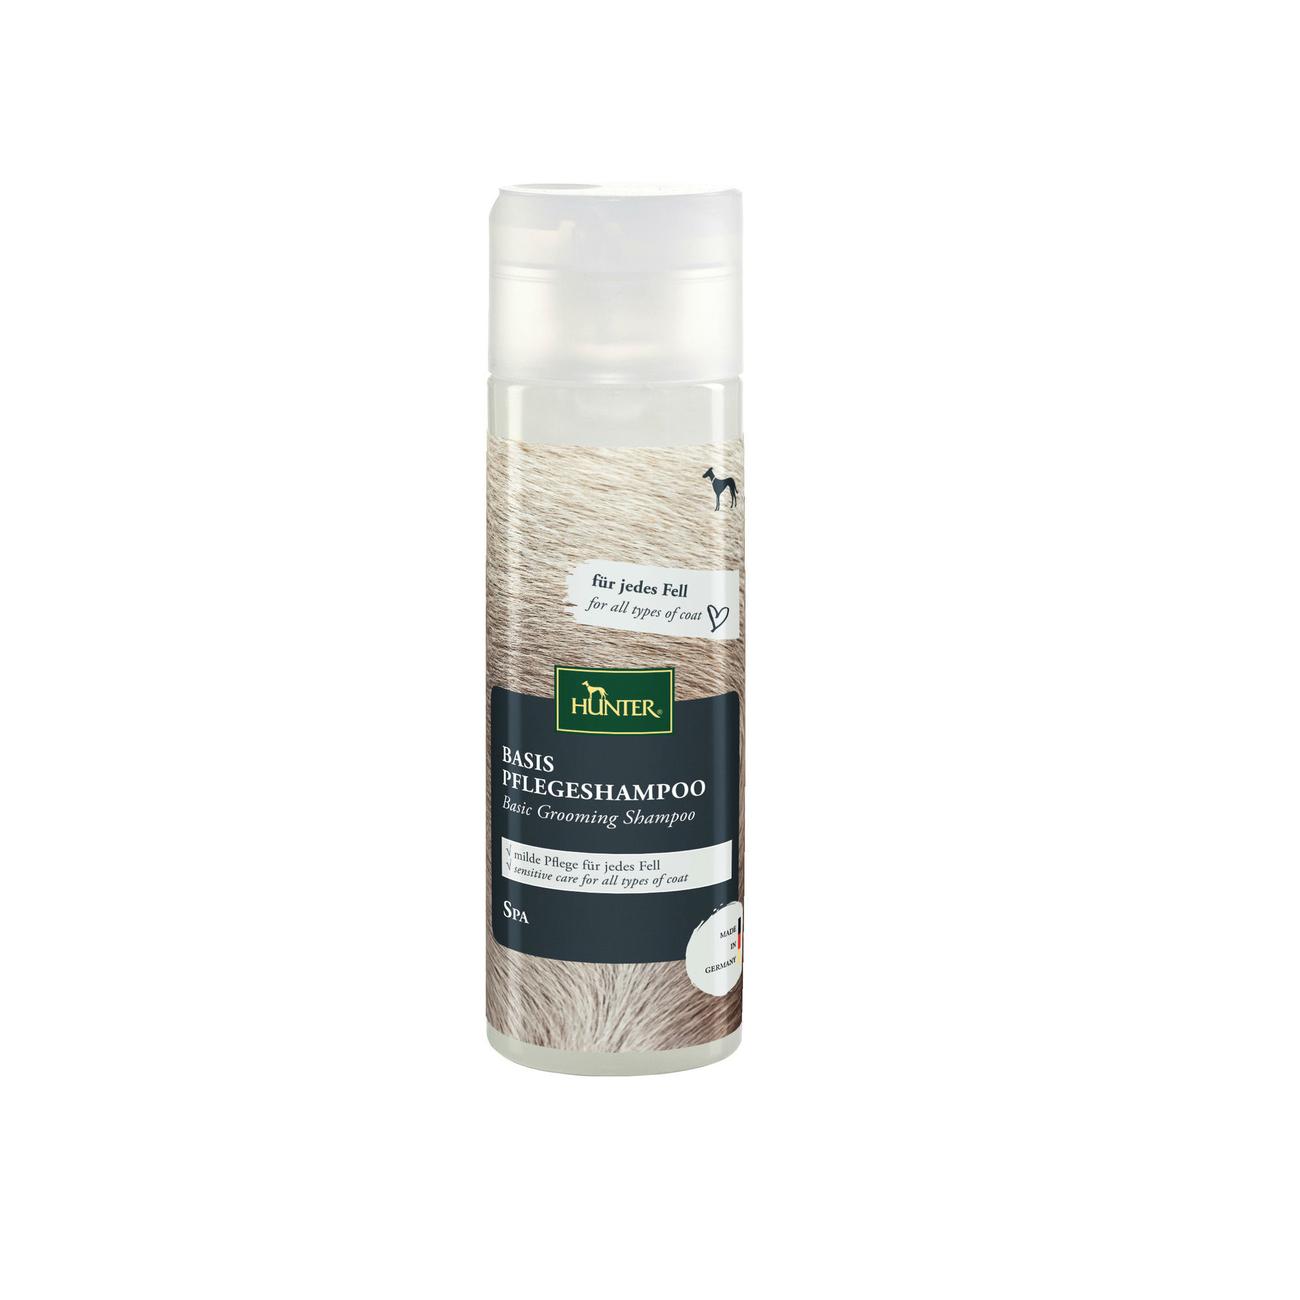 Hunter Basis Pflegeshampoo für Hunde Pure Wellness 62026